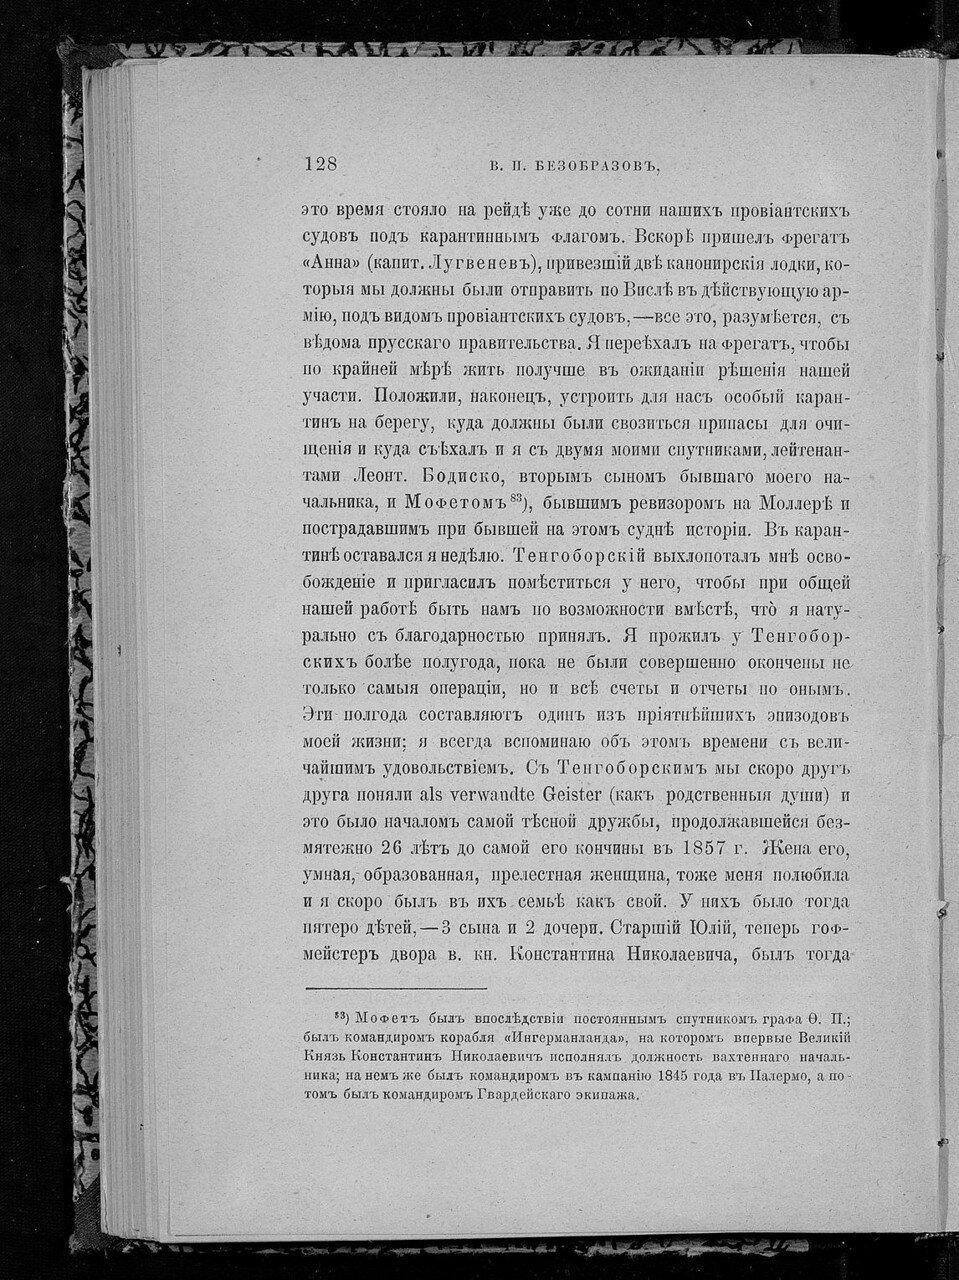 https://img-fotki.yandex.ru/get/893194/199368979.d5/0_21de1f_1844320a_XXXL.jpg